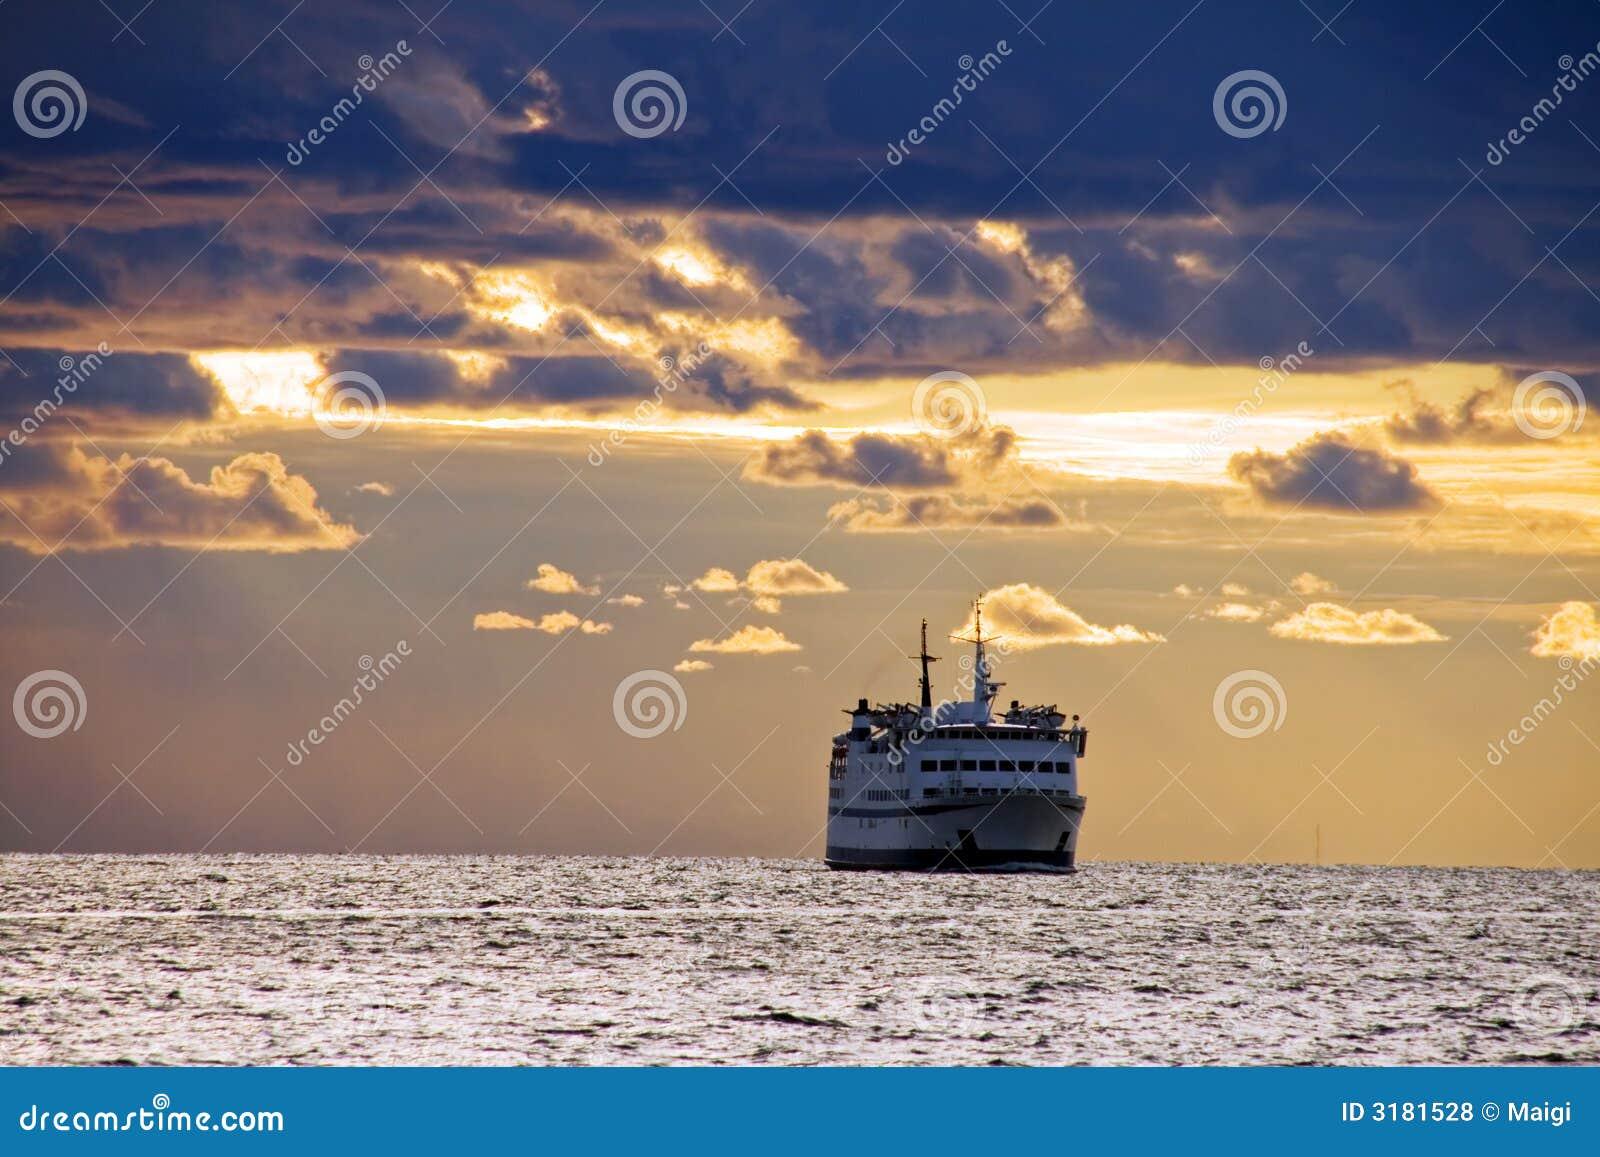 Ship On Sea Royalty Free Stock Photos  Image 3181528